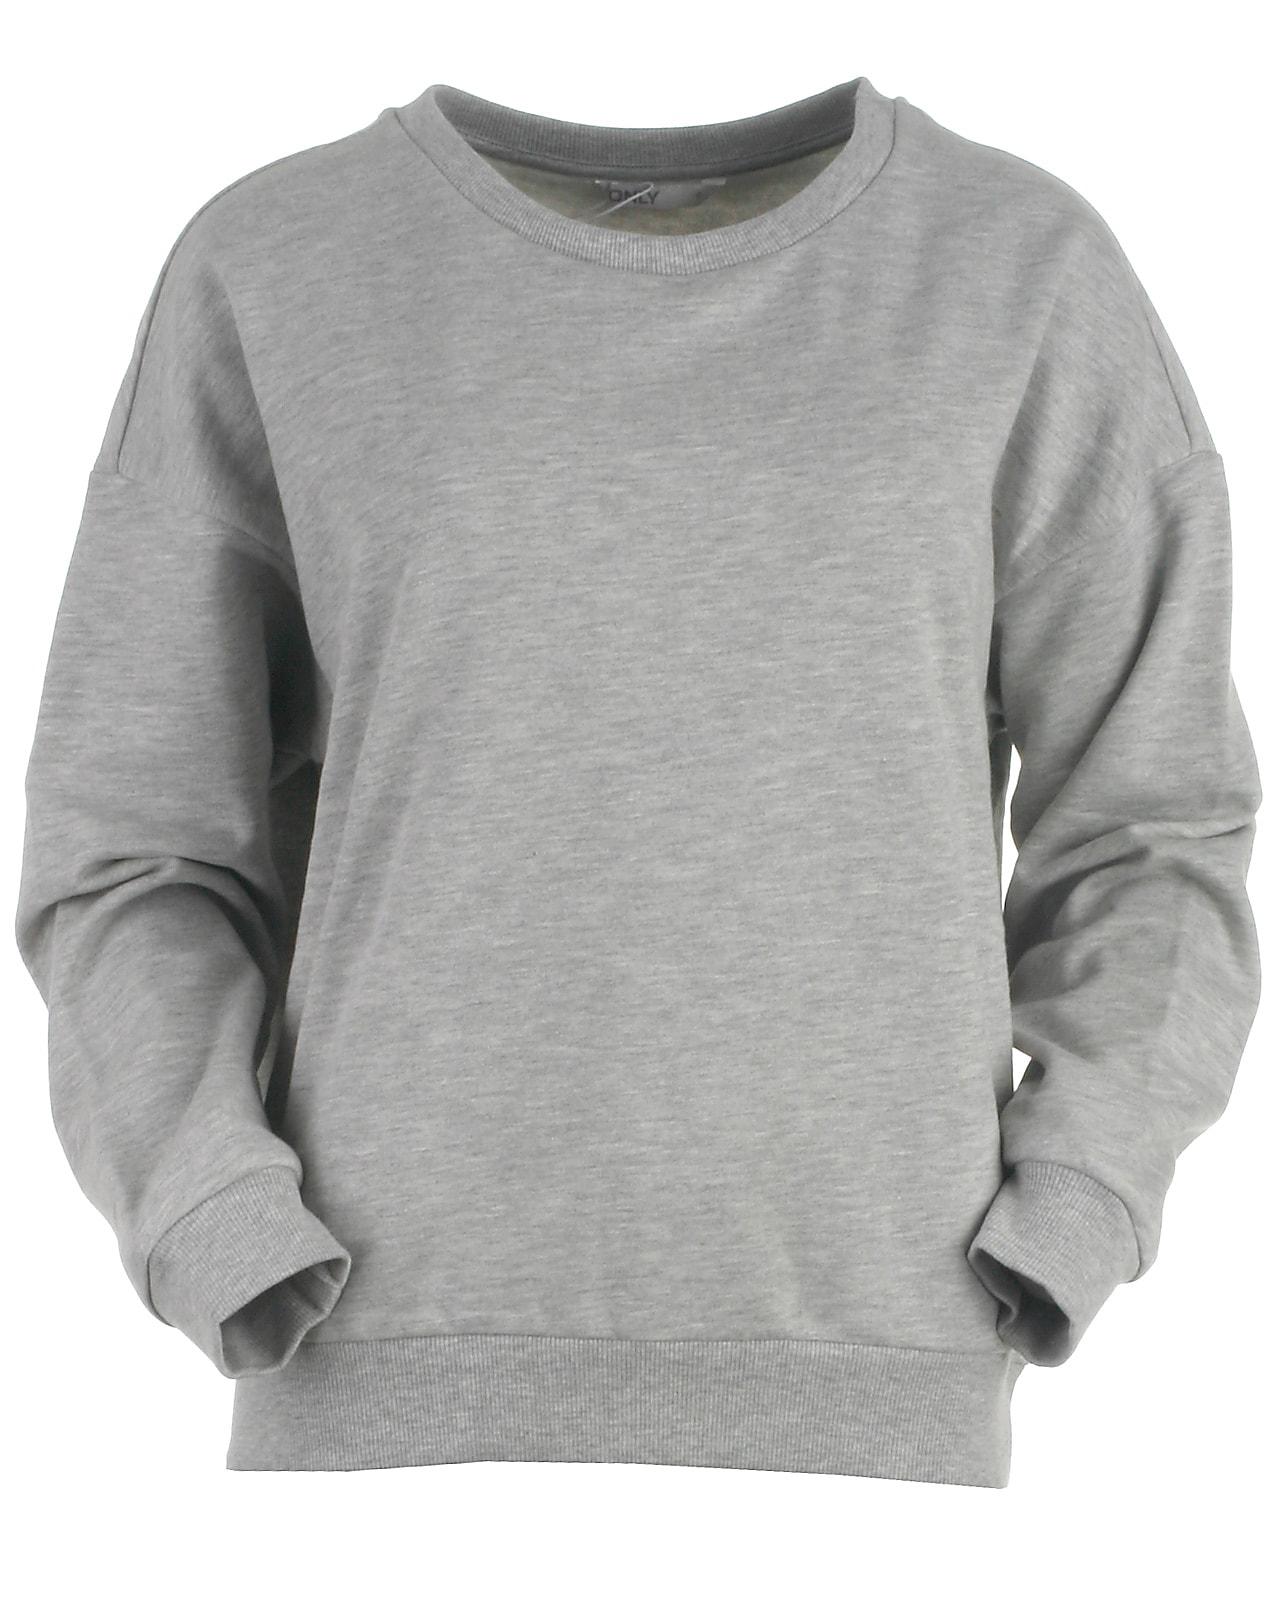 Only sweatshirt, Dreamer, lightgrey